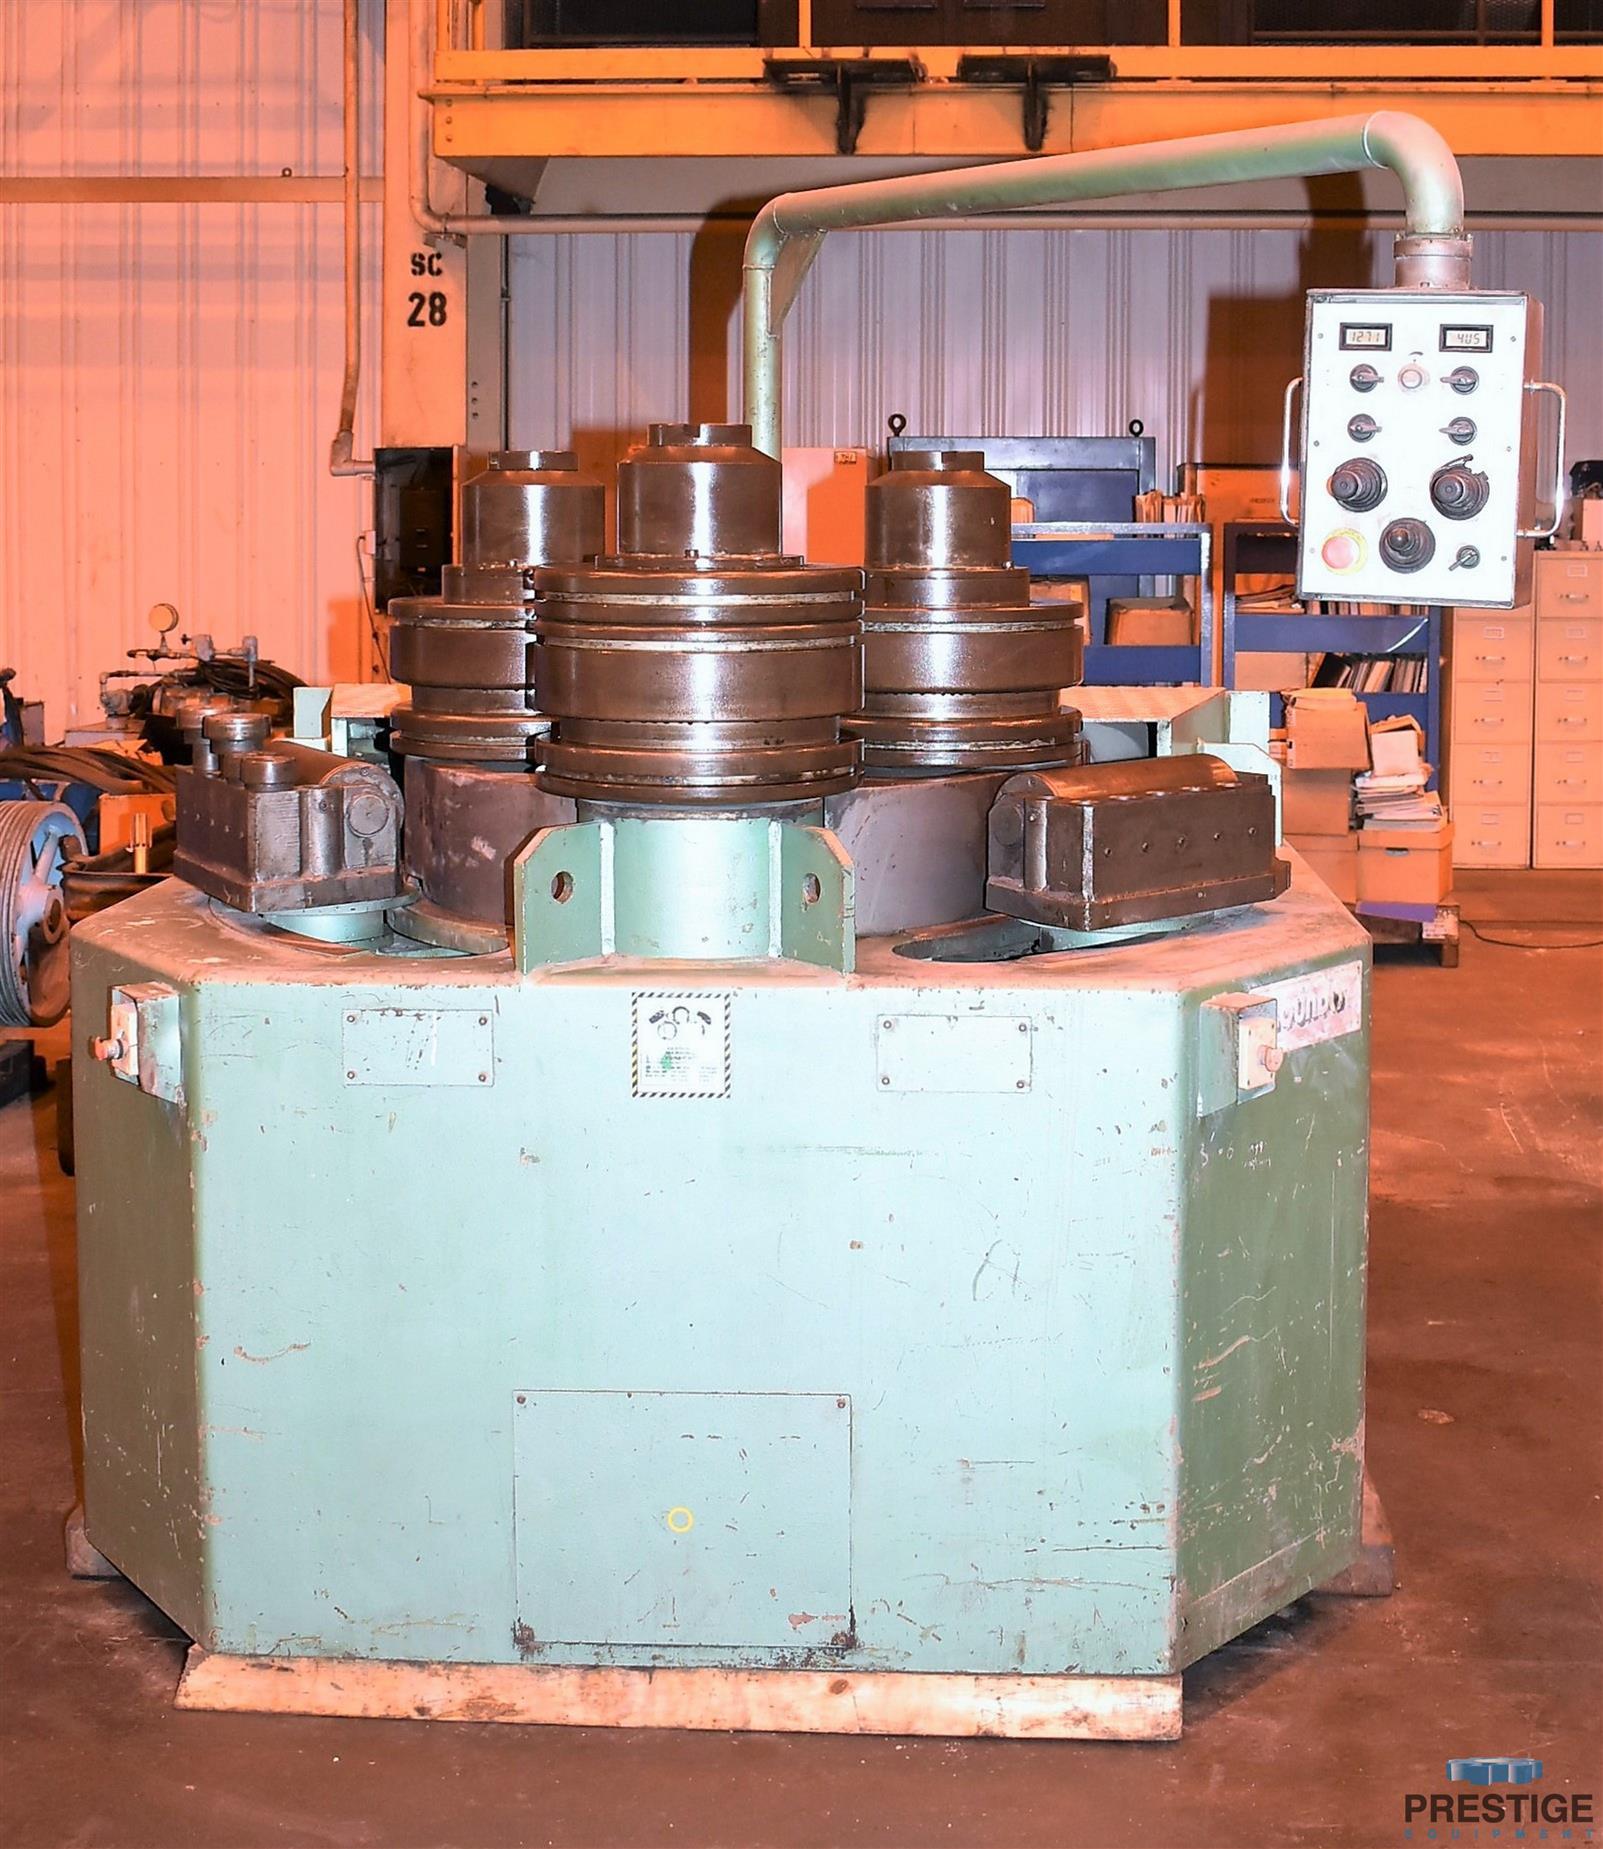 Roundo R6S 152 MM  x 152 MM  x 16 MM  Horizontal Angle Bending Roll-31504a